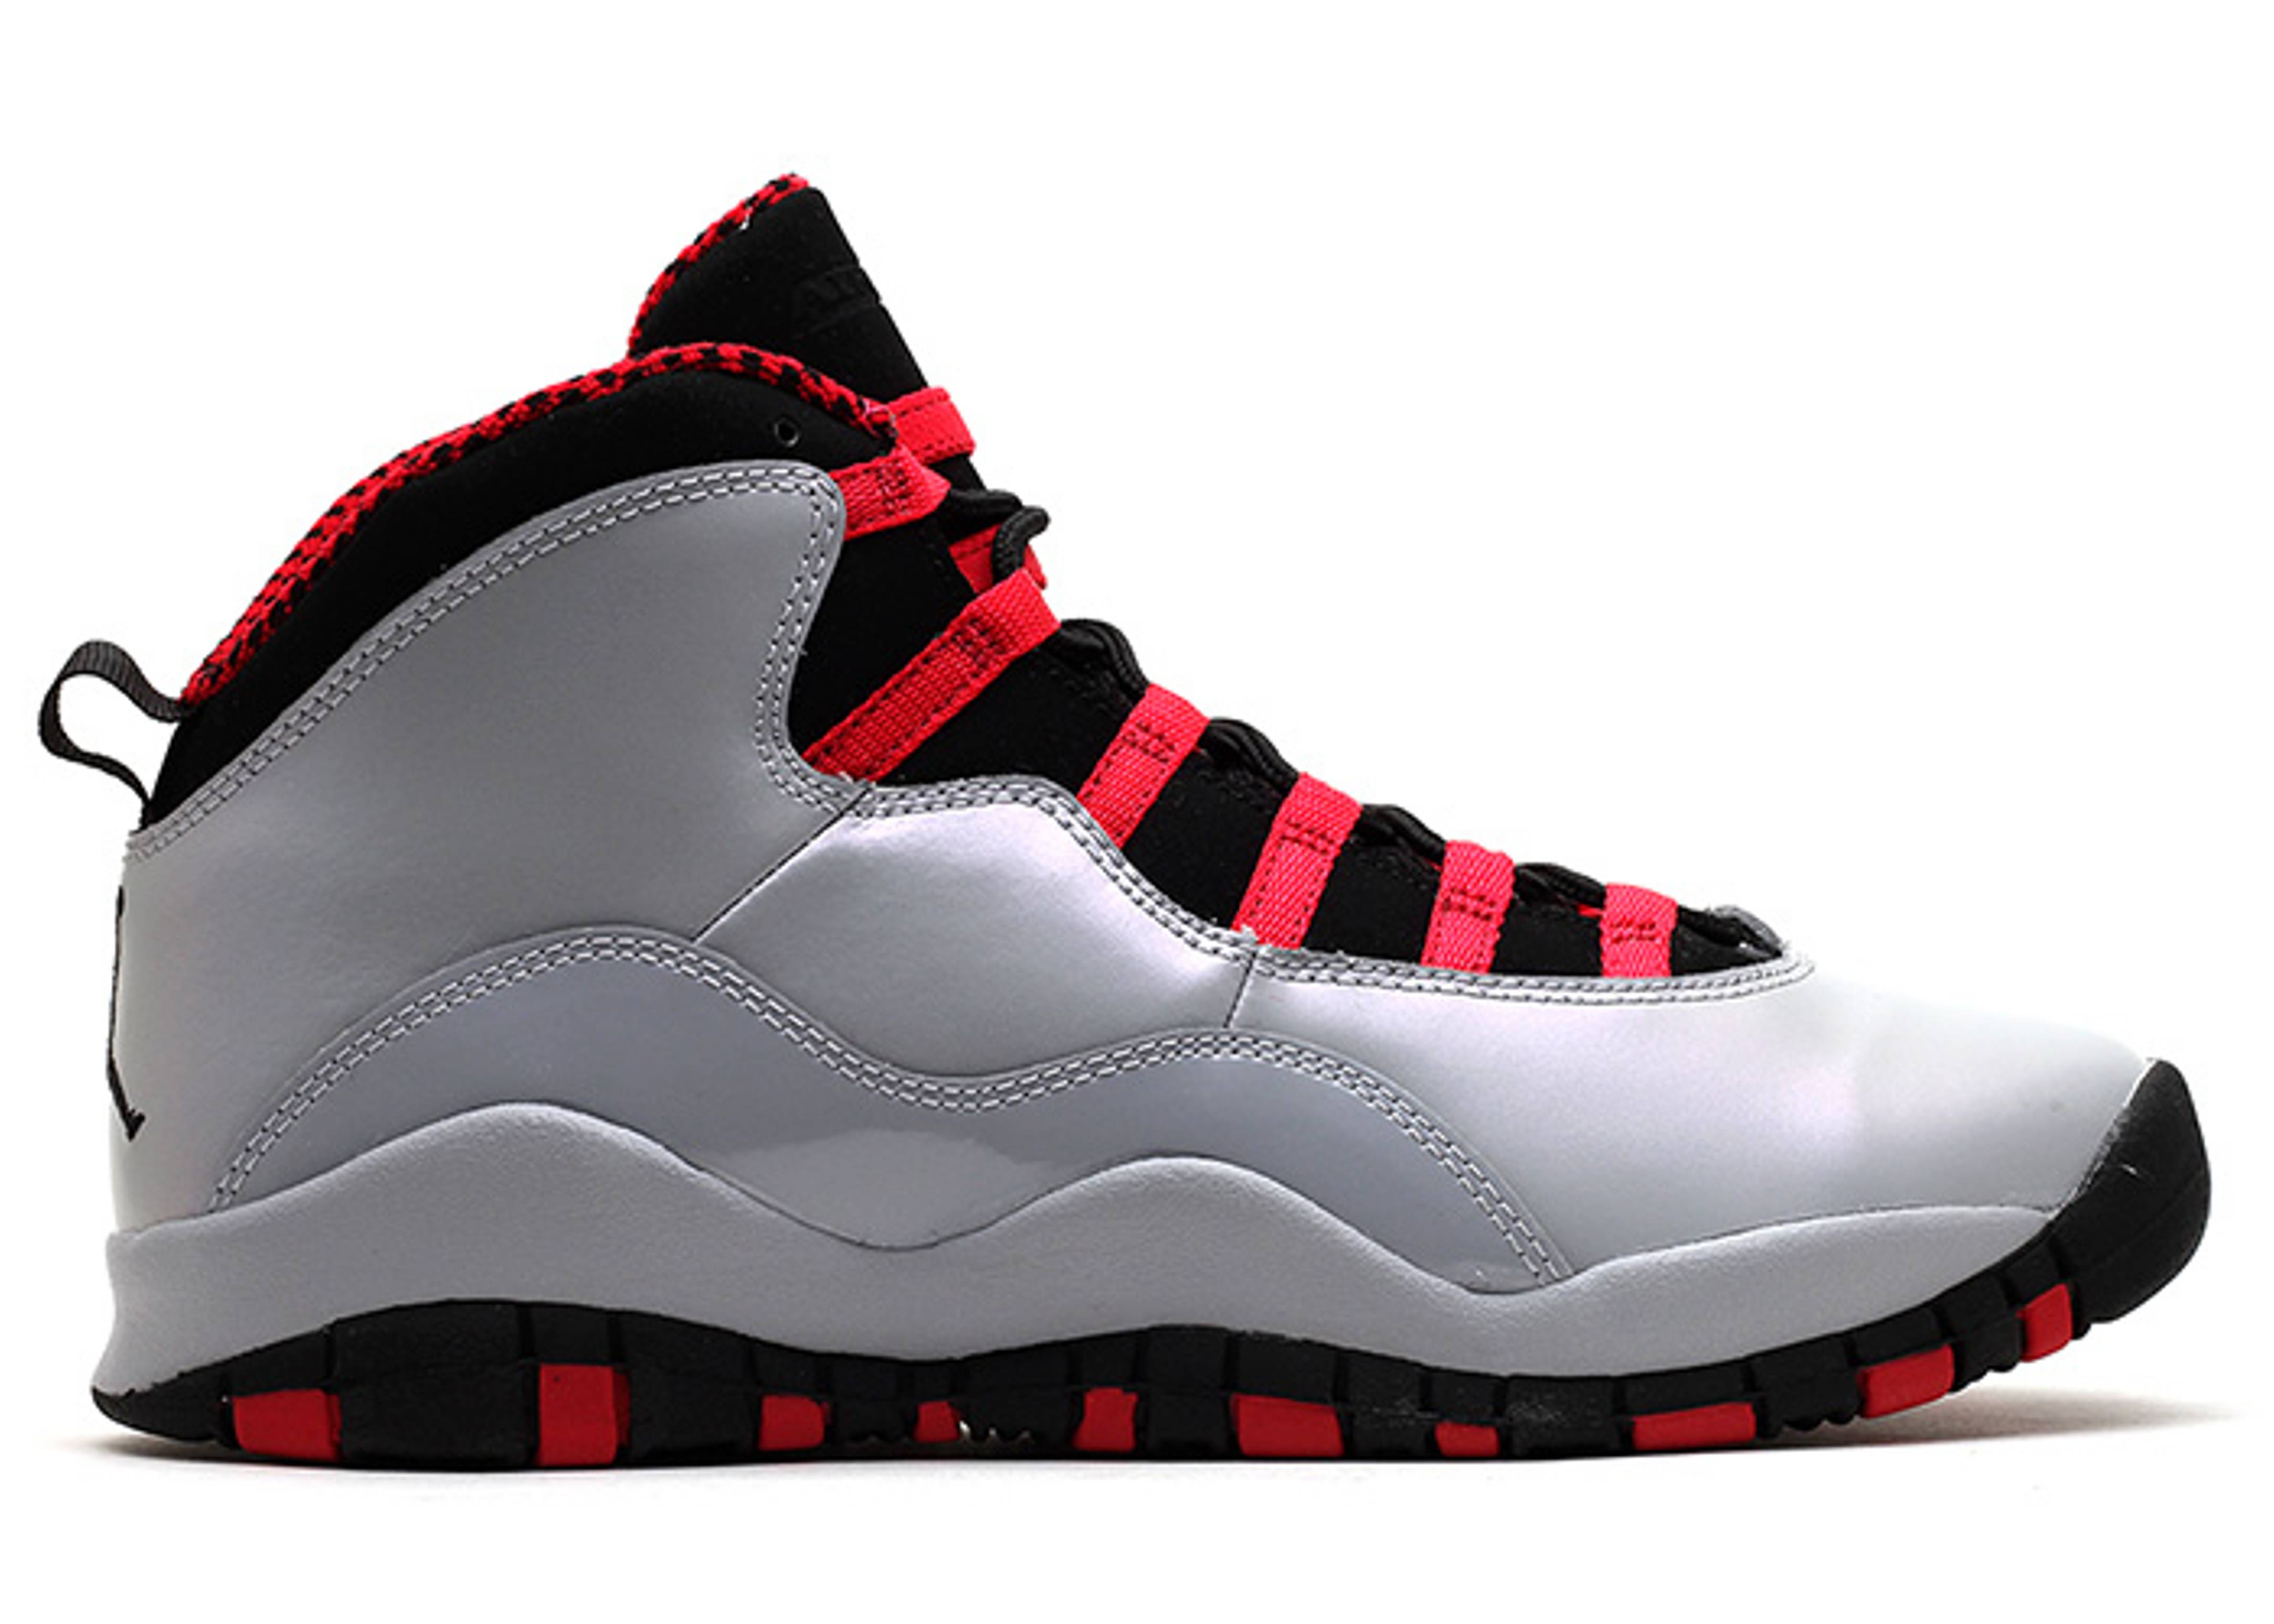 c9b627ef632a65 Girls Air Jordan 10 Retro (gs) - Air Jordan - 487211 009 - wolf grey black-legion  re